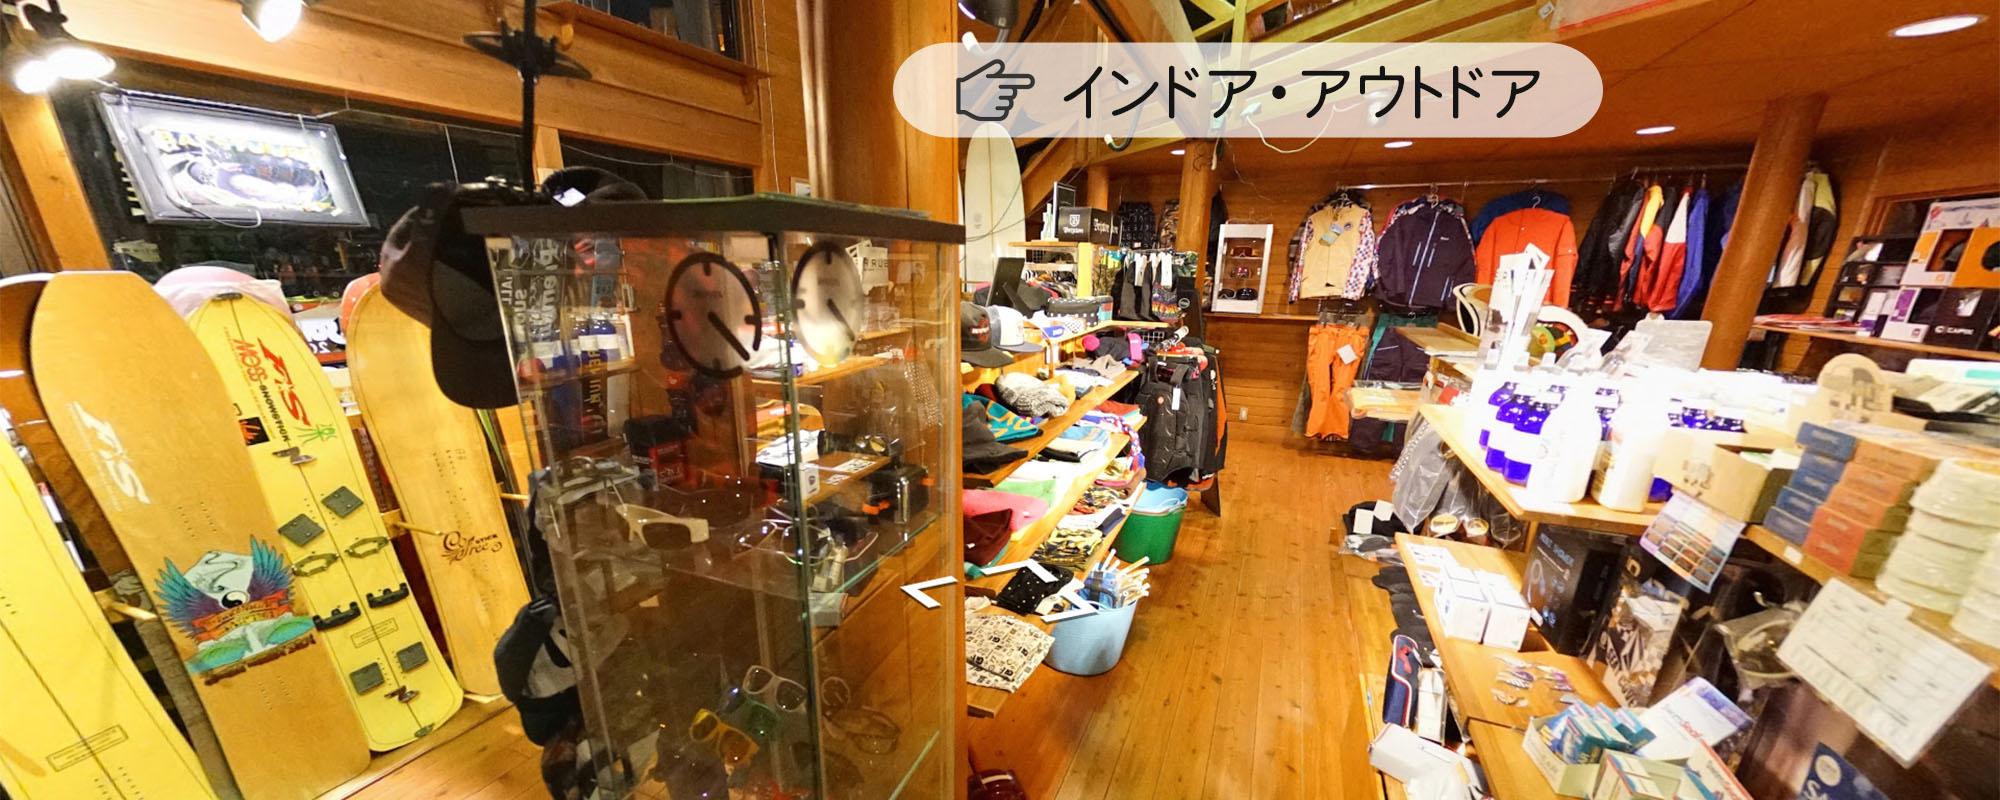 Googleストリートビューのアウトドア・インドア・お店フォト撮影事例